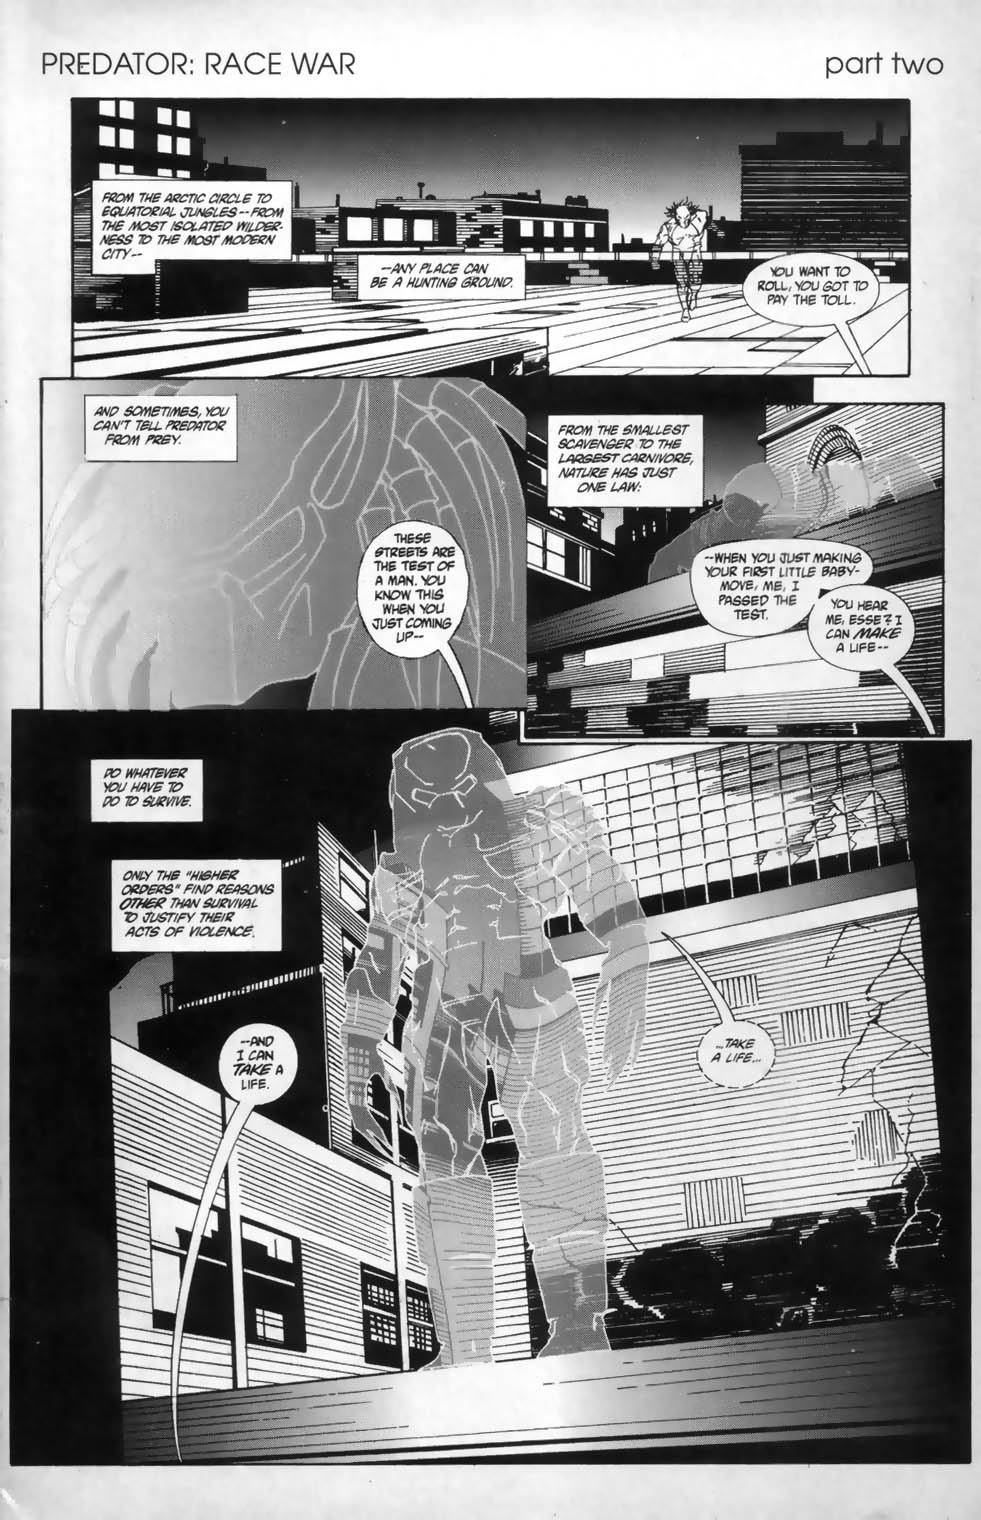 Dark Horse Presents (1986) #68 pg1, penciled by Jordan Raskin & inked by Bob Wiacek.